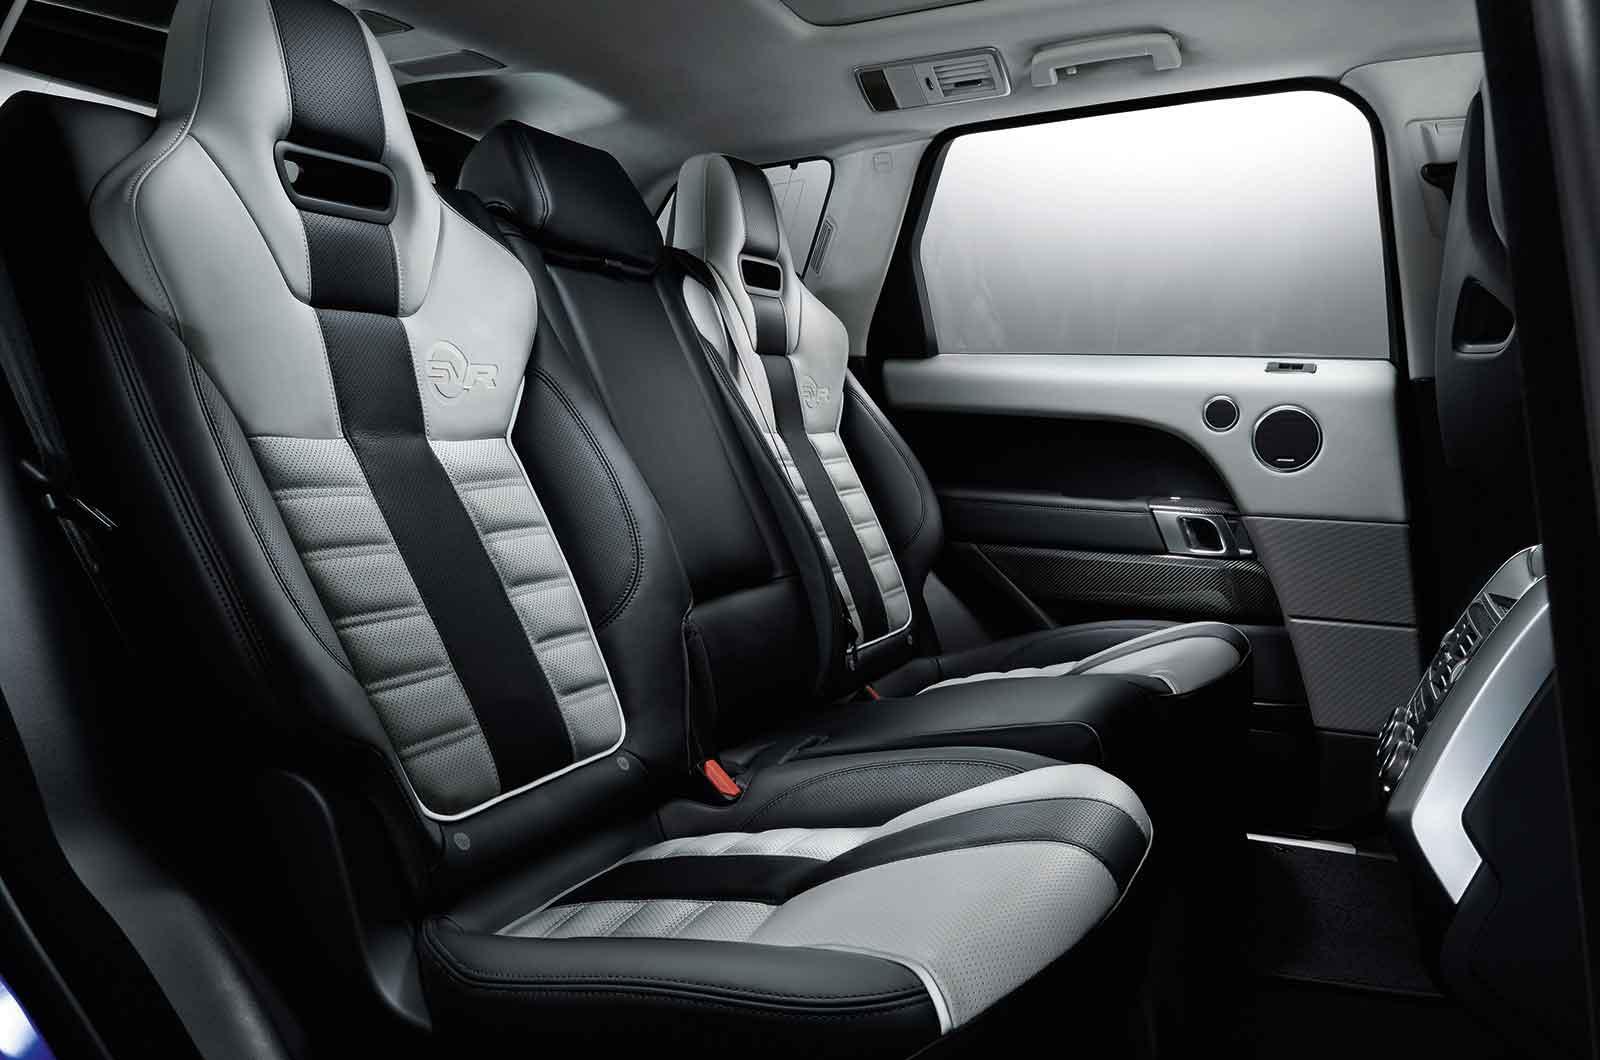 http://images.cdn.autocar.co.uk/sites/autocar.co.uk/files/range-rover-svr-67y20.jpg